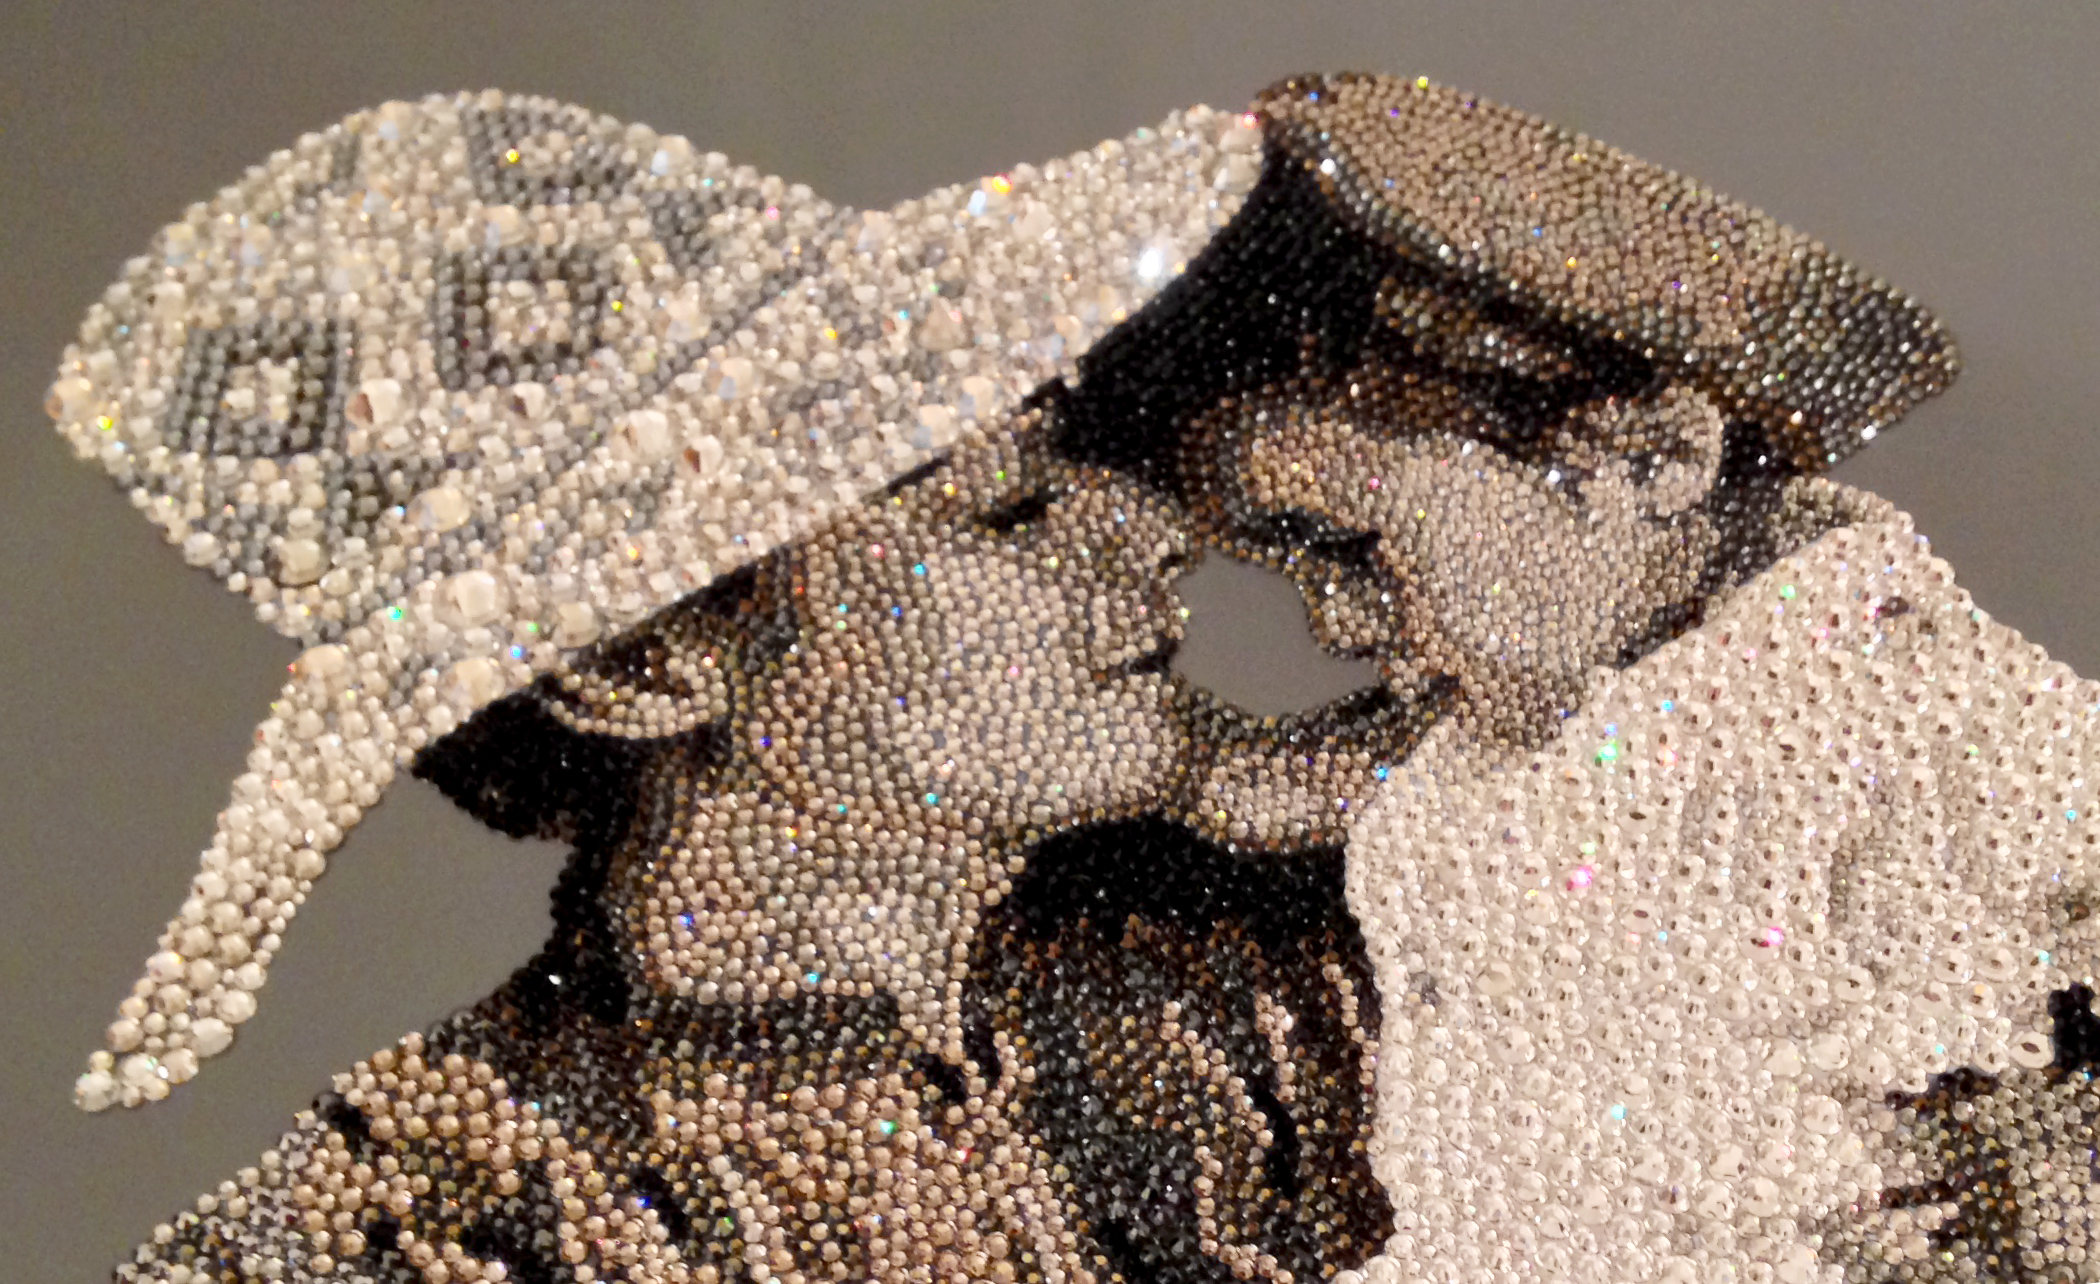 HRH Princess Haya Natalie Daghestani Swarovski Crystal Art2